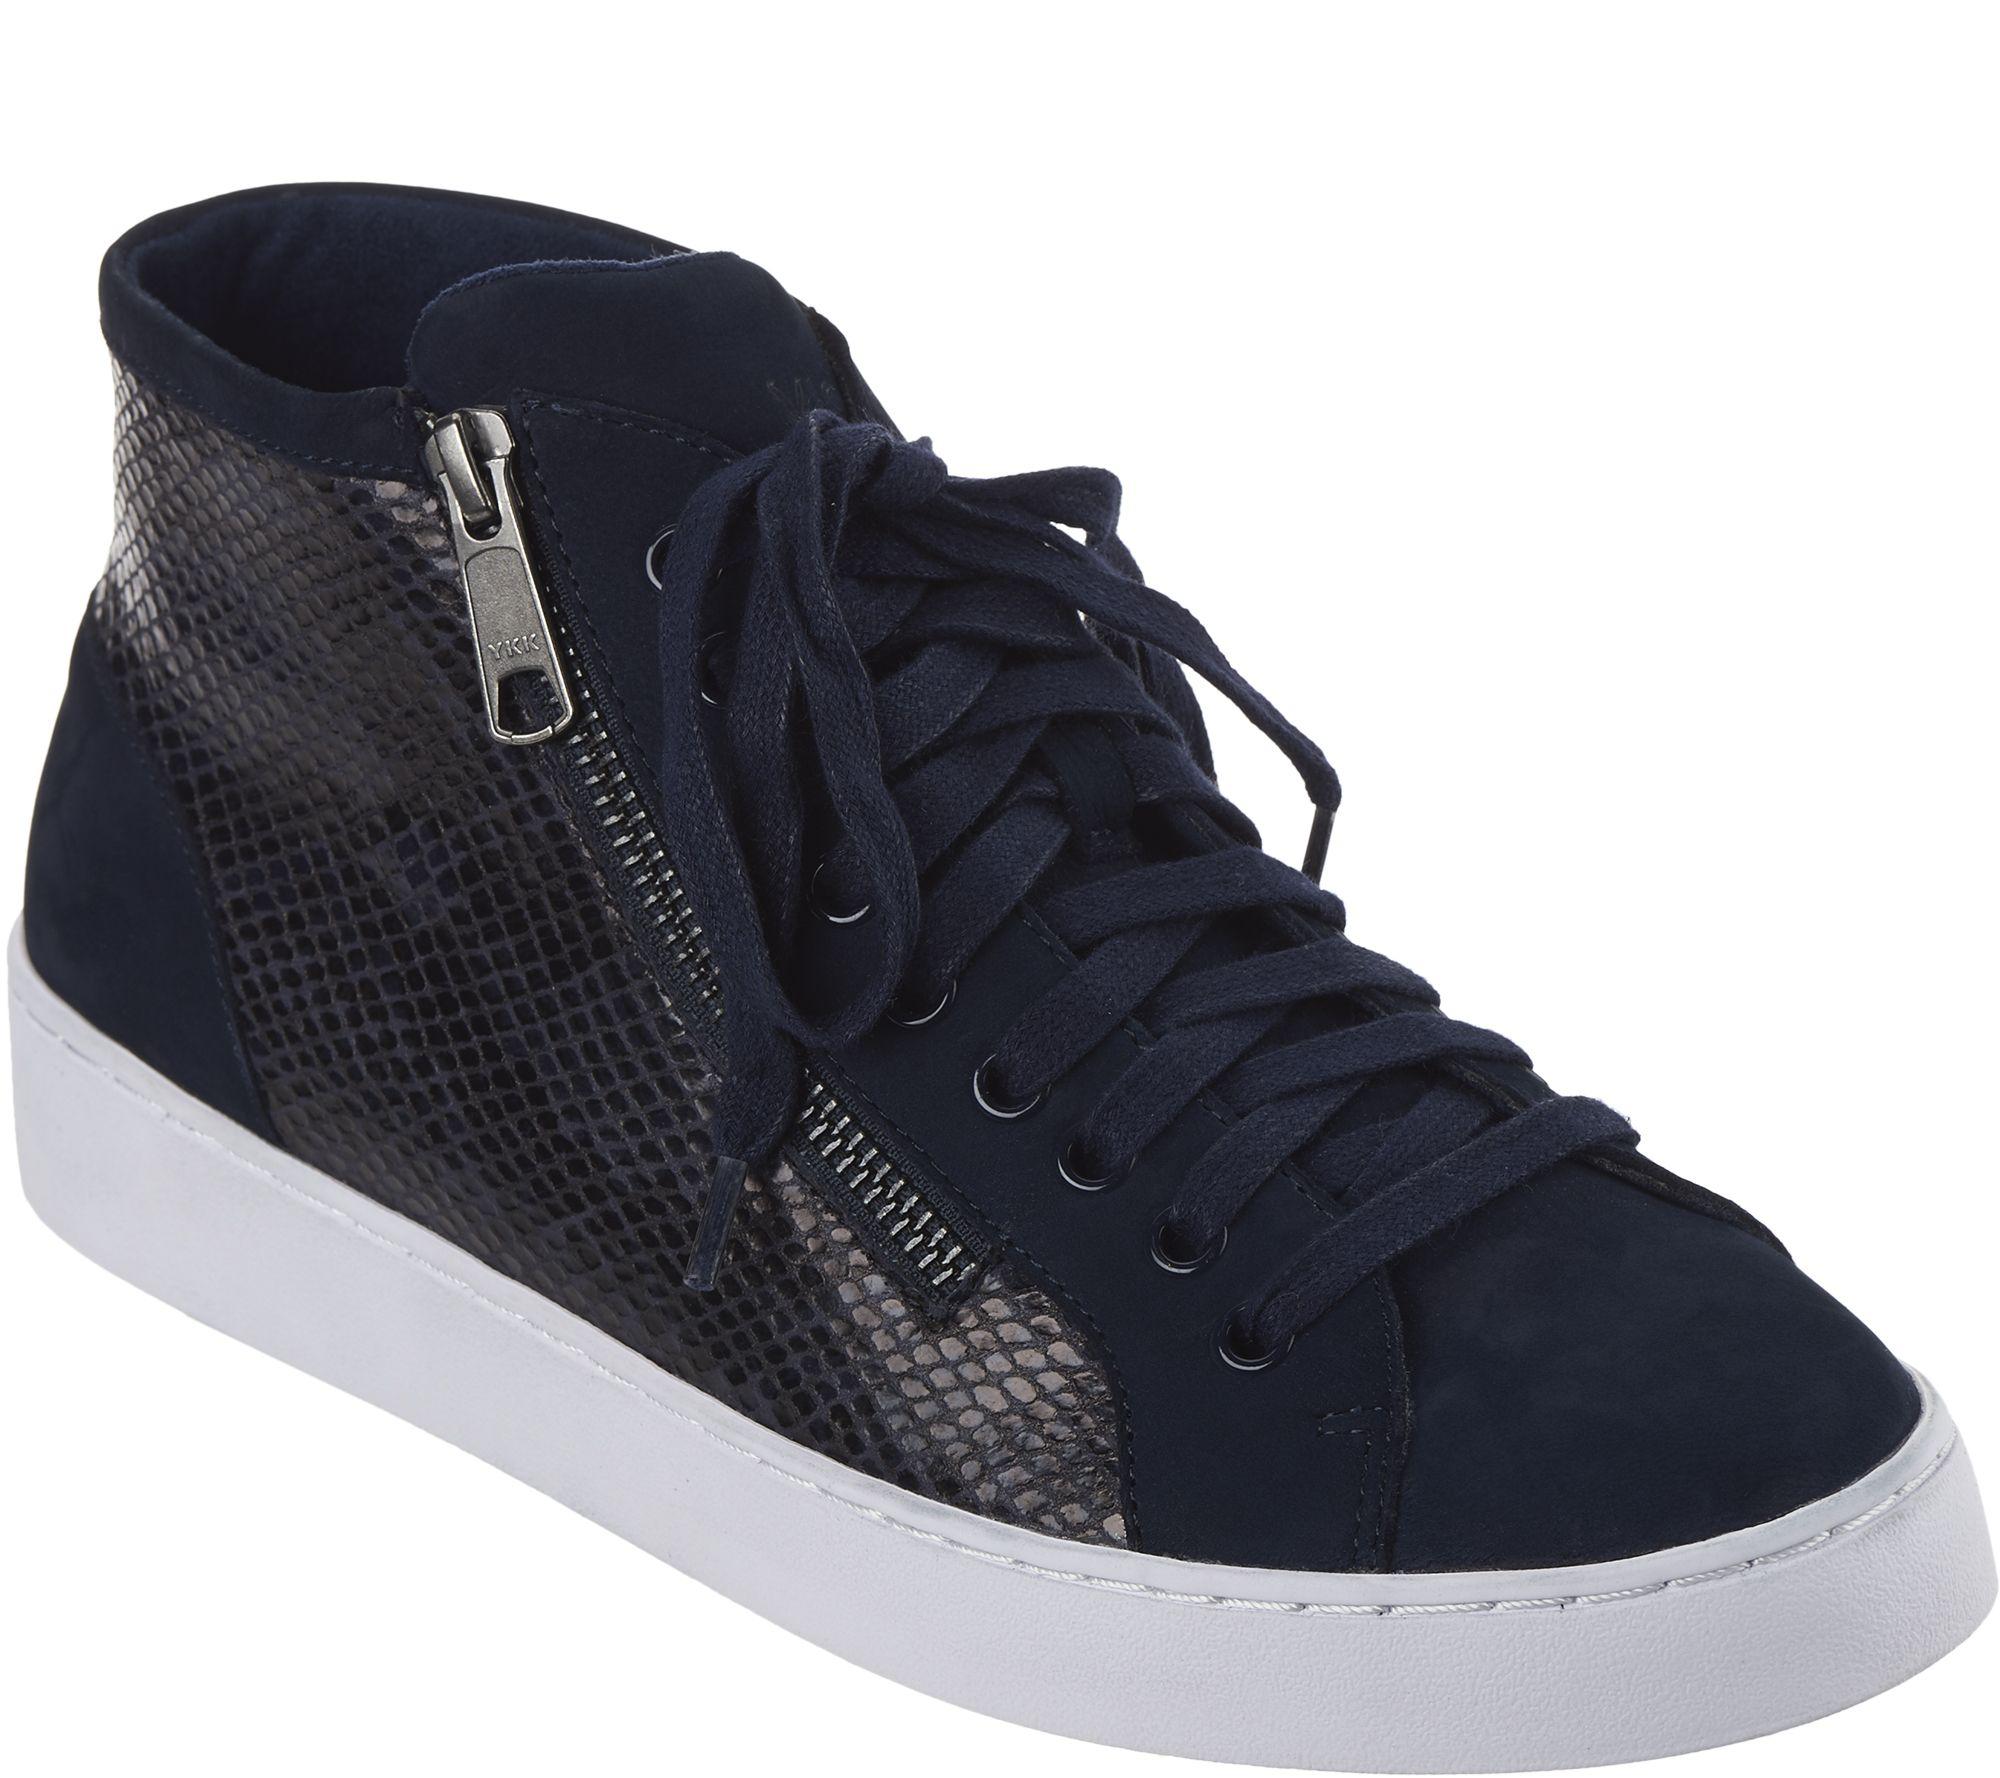 34591c2cd580 Vionic Lace-up High-Top Sneakers - Torri - Page 1 — QVC.com